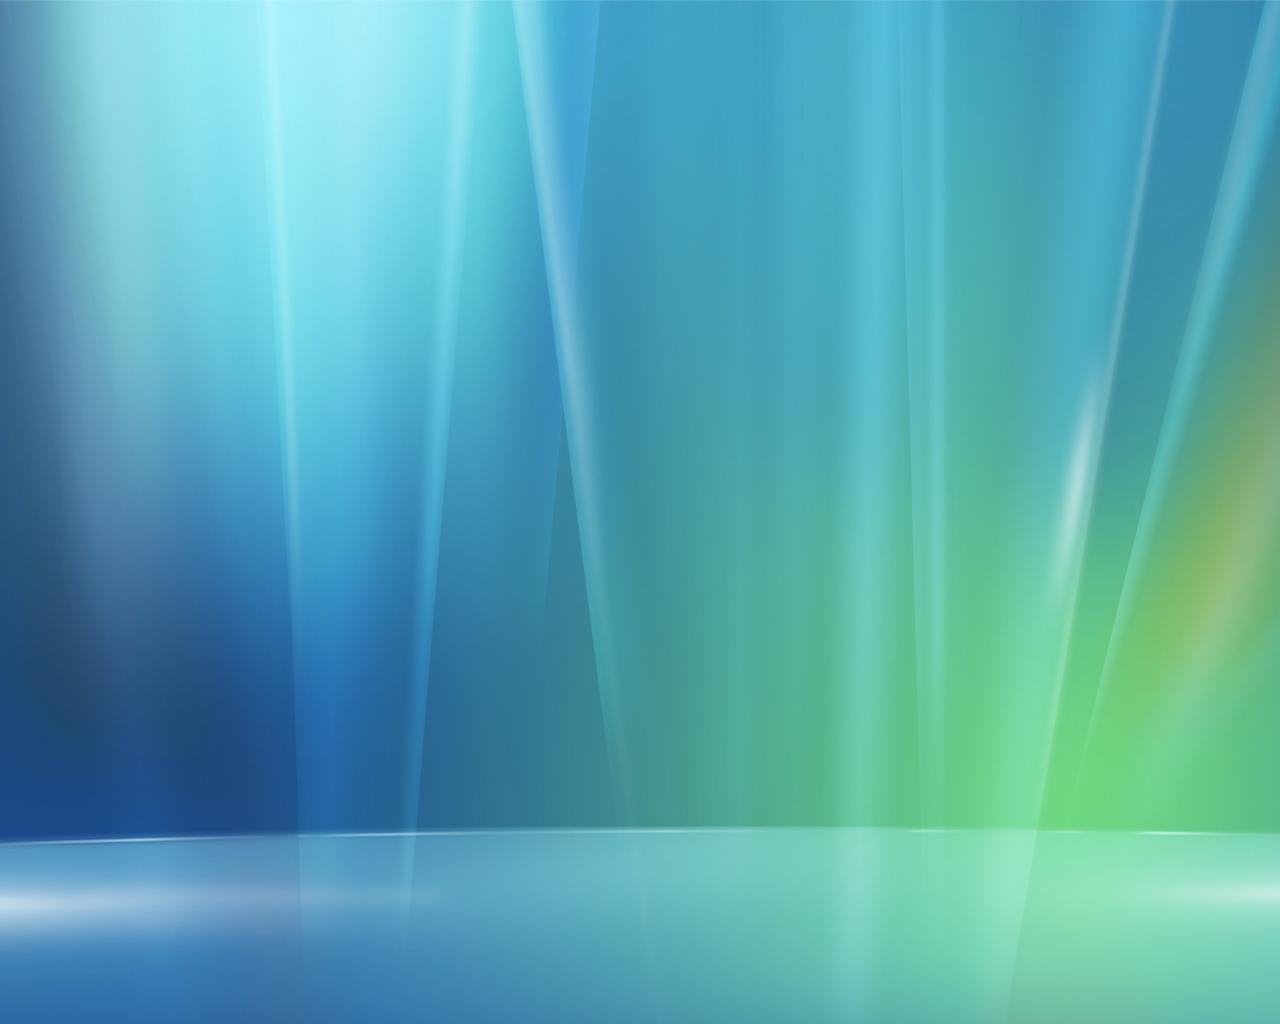 http://2.bp.blogspot.com/-LyvIUnBxRng/TZUMNuKohYI/AAAAAAAADUE/r2N0UTWMMAY/s1600/Green-Aurora-wallpaper.jpg